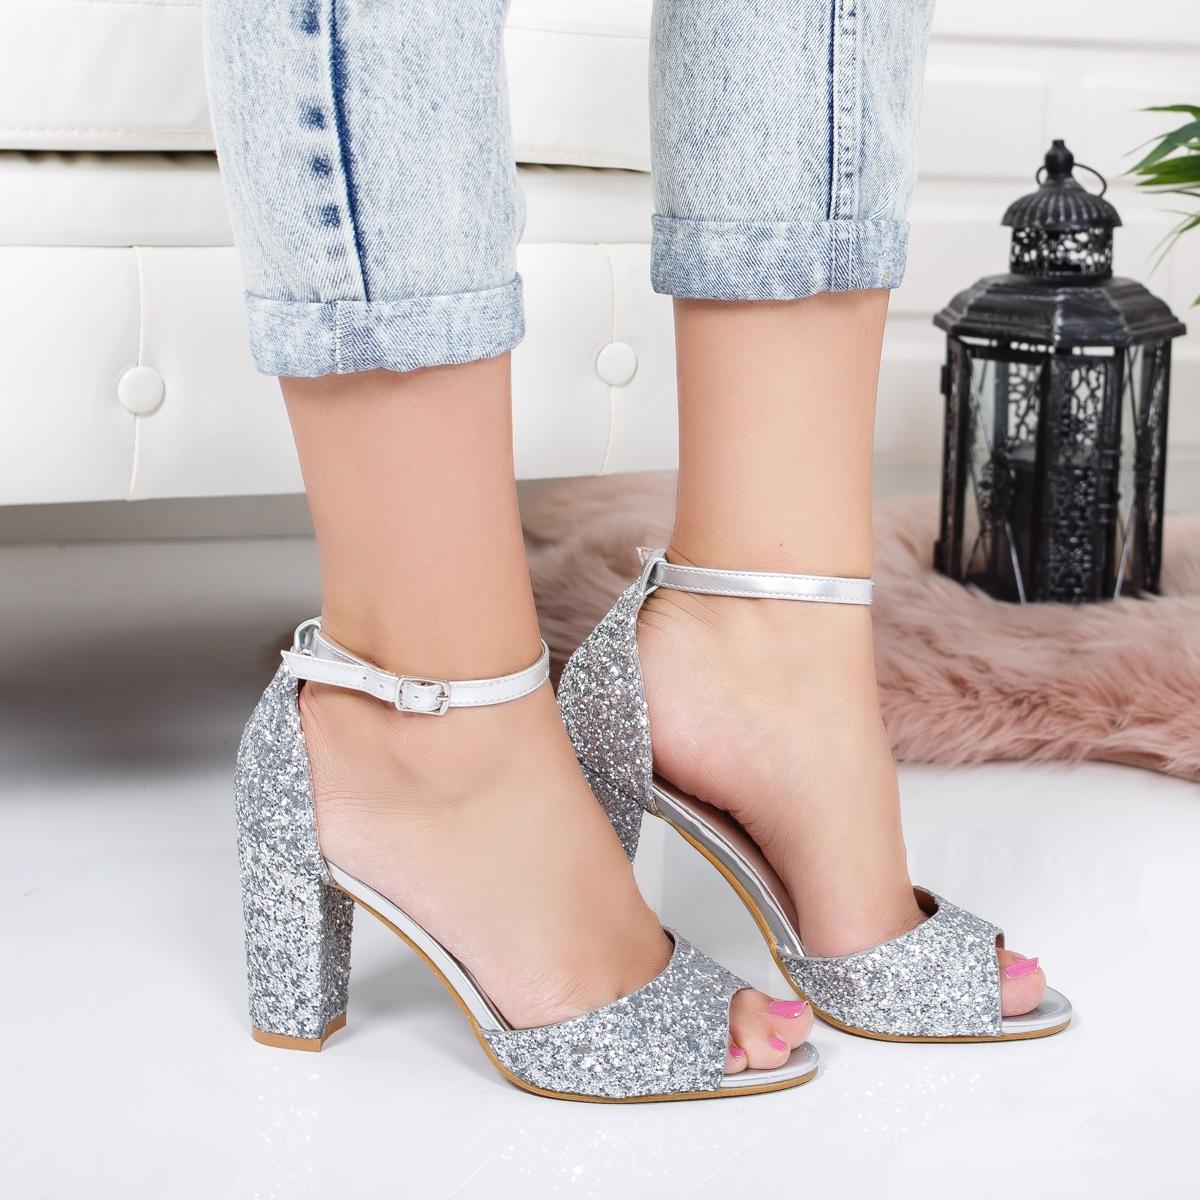 Gros Mic Dama Sandale Argintii Toc Lucioase Elegante Cu 0kn8PXwO